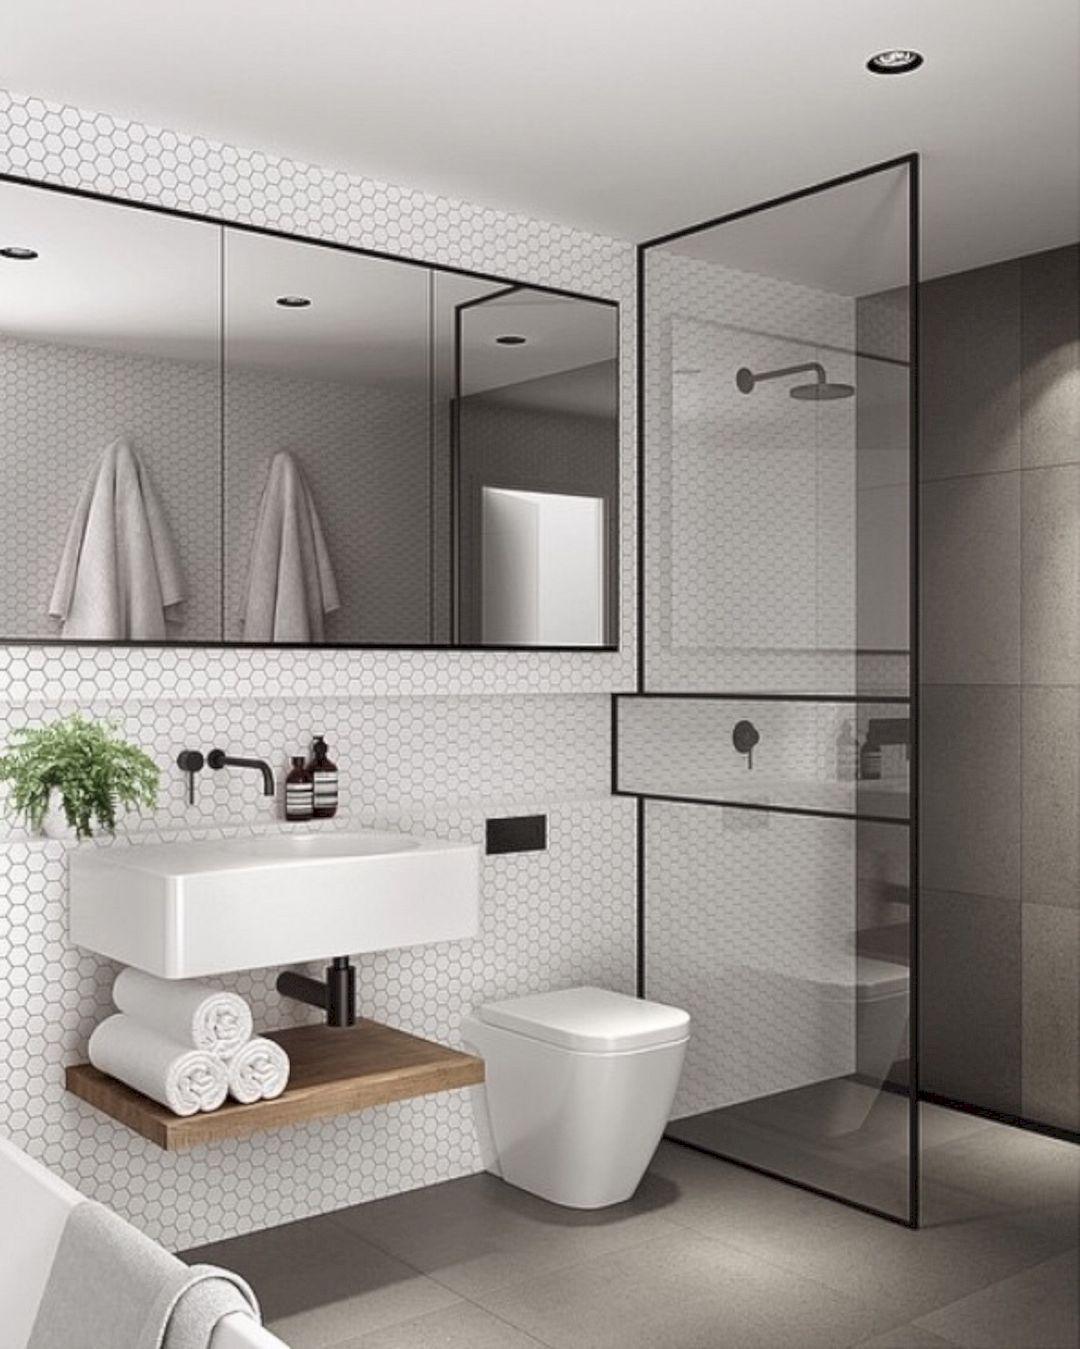 16 Small Bathroom Renovation Ideas Modern Bathroom Design Bathroom Interior Design Small Bathroom Remodel